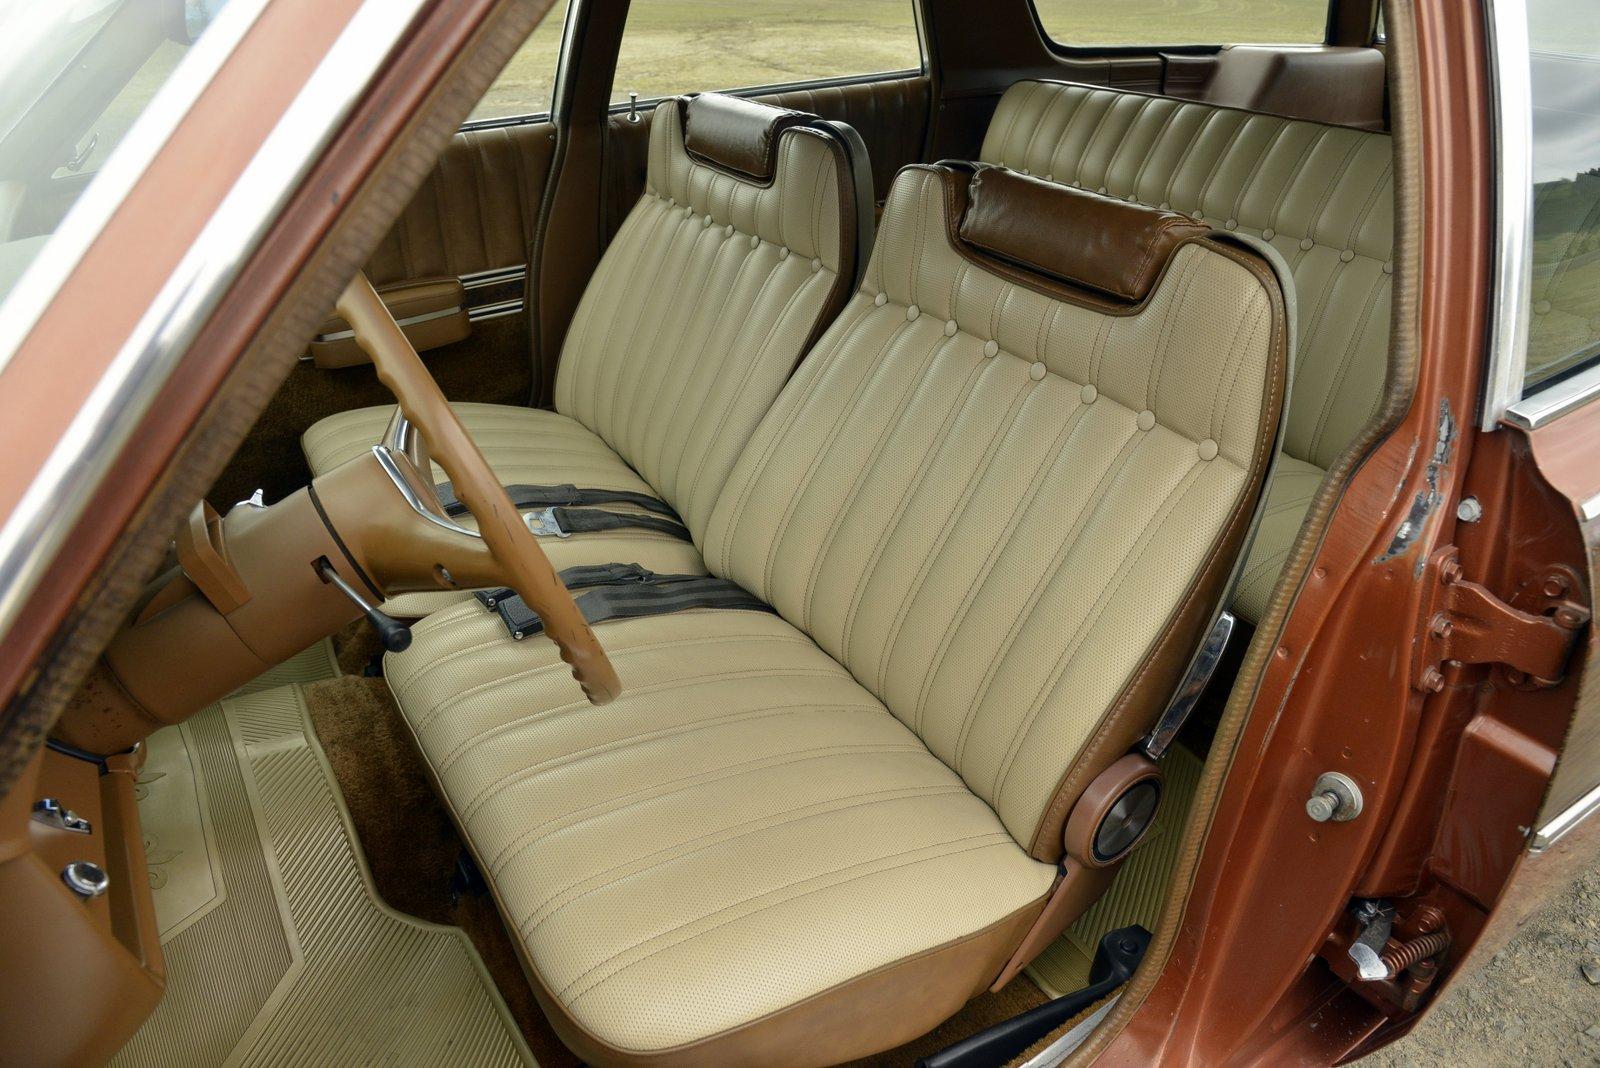 1972 AMC Ambassador Brougham Wagon driver seat